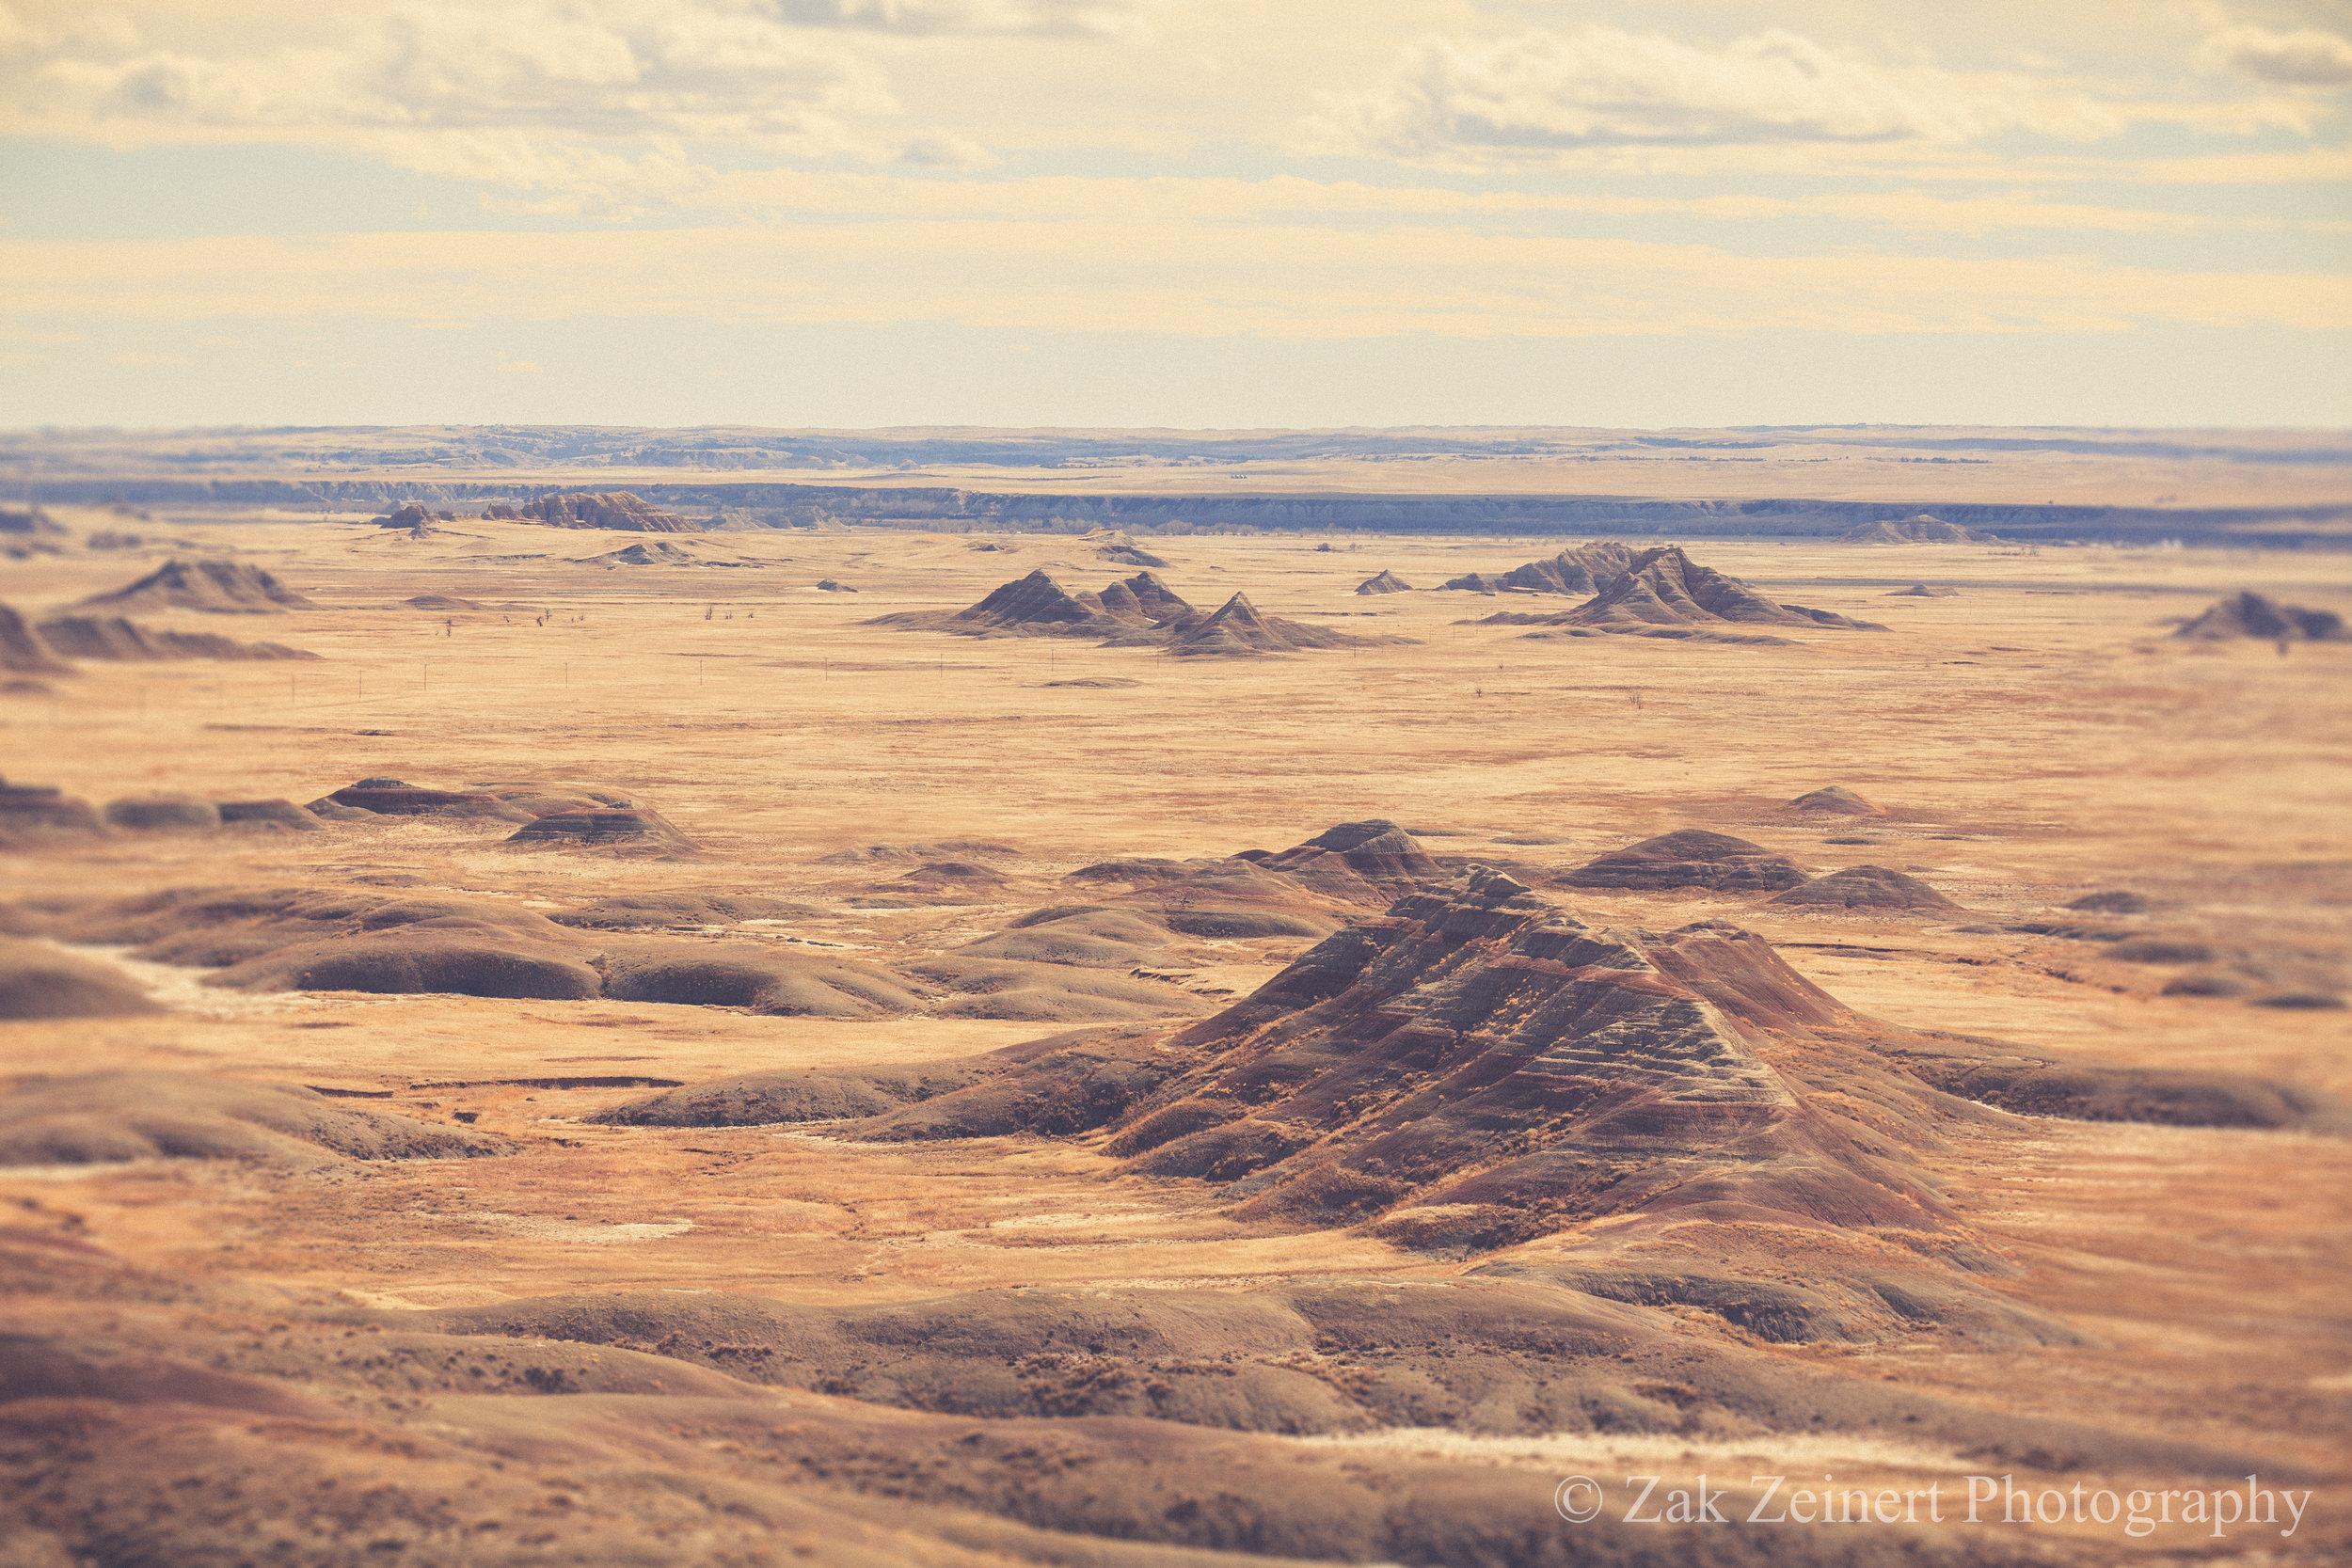 The stunning landscape of the Badlands